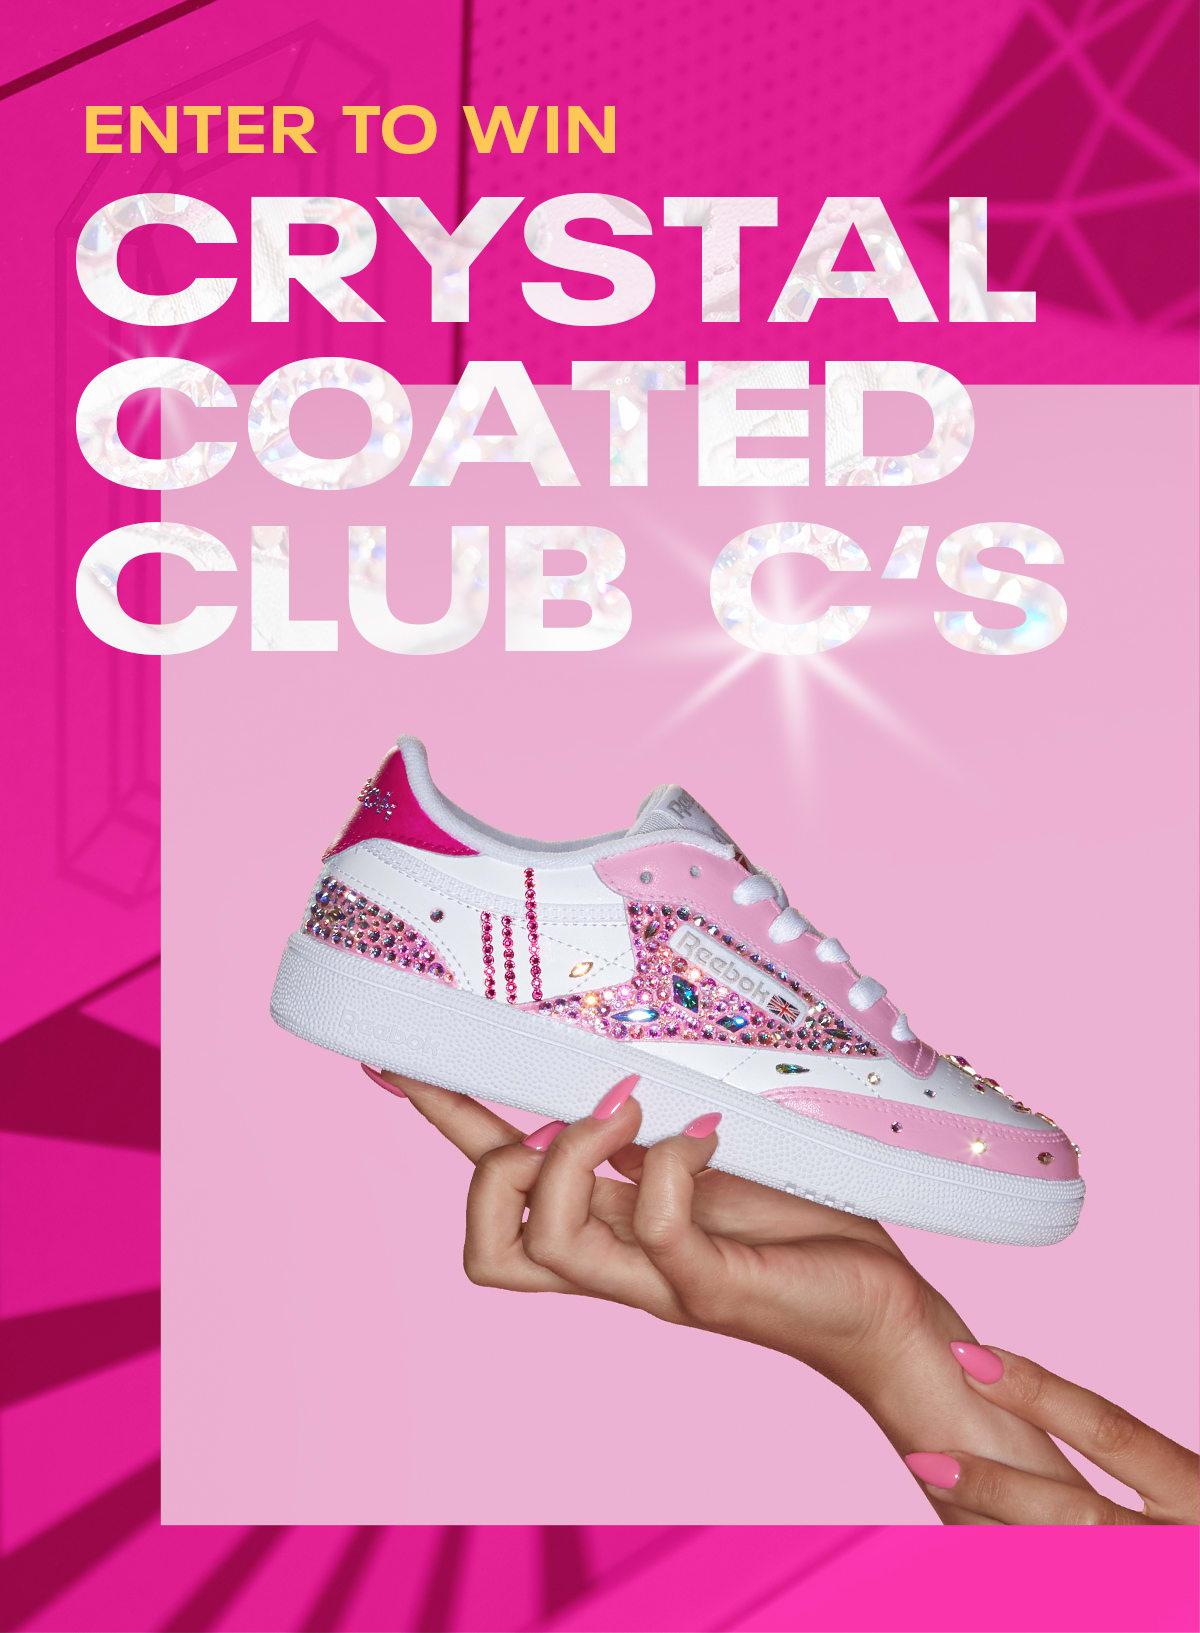 Reebok Crystal Club C's – Enter To Win